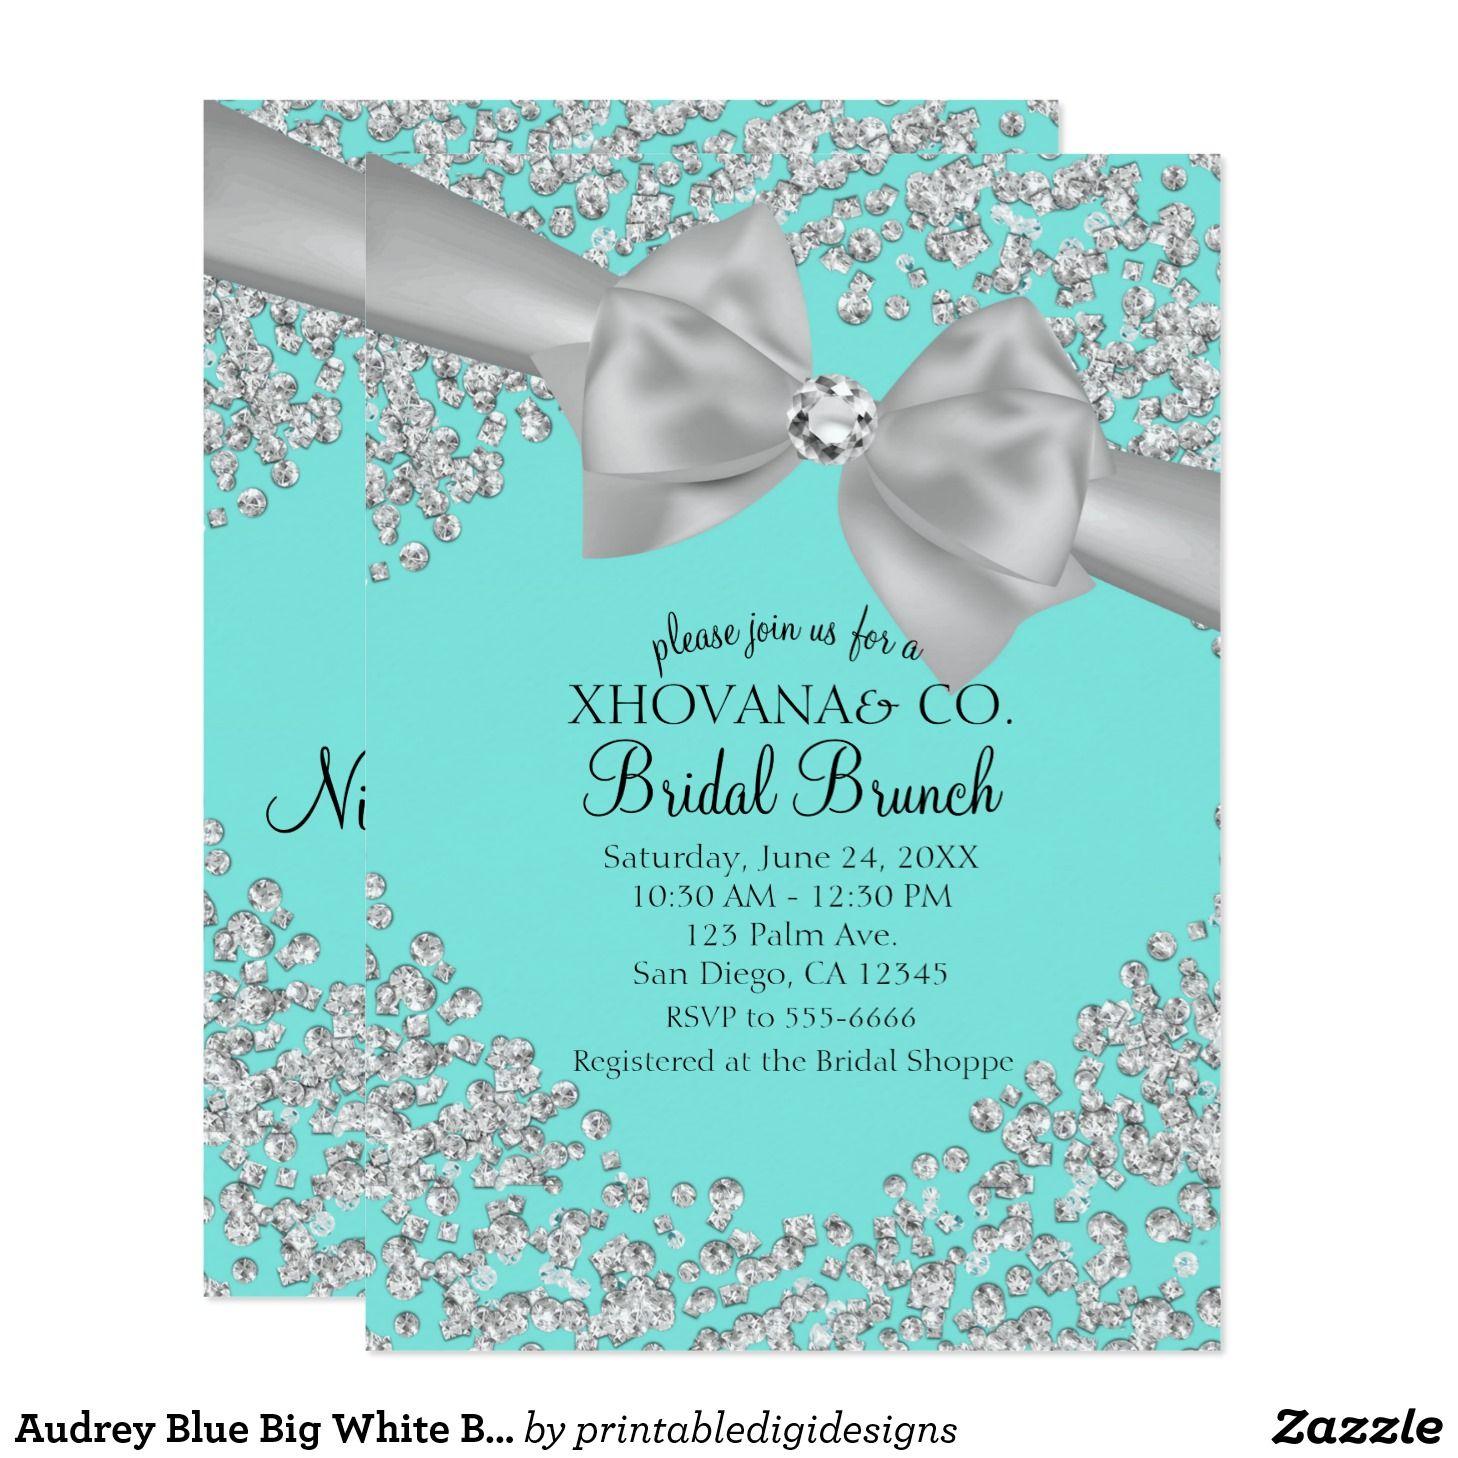 audrey blue big white bow diamonds bridal shower invitation